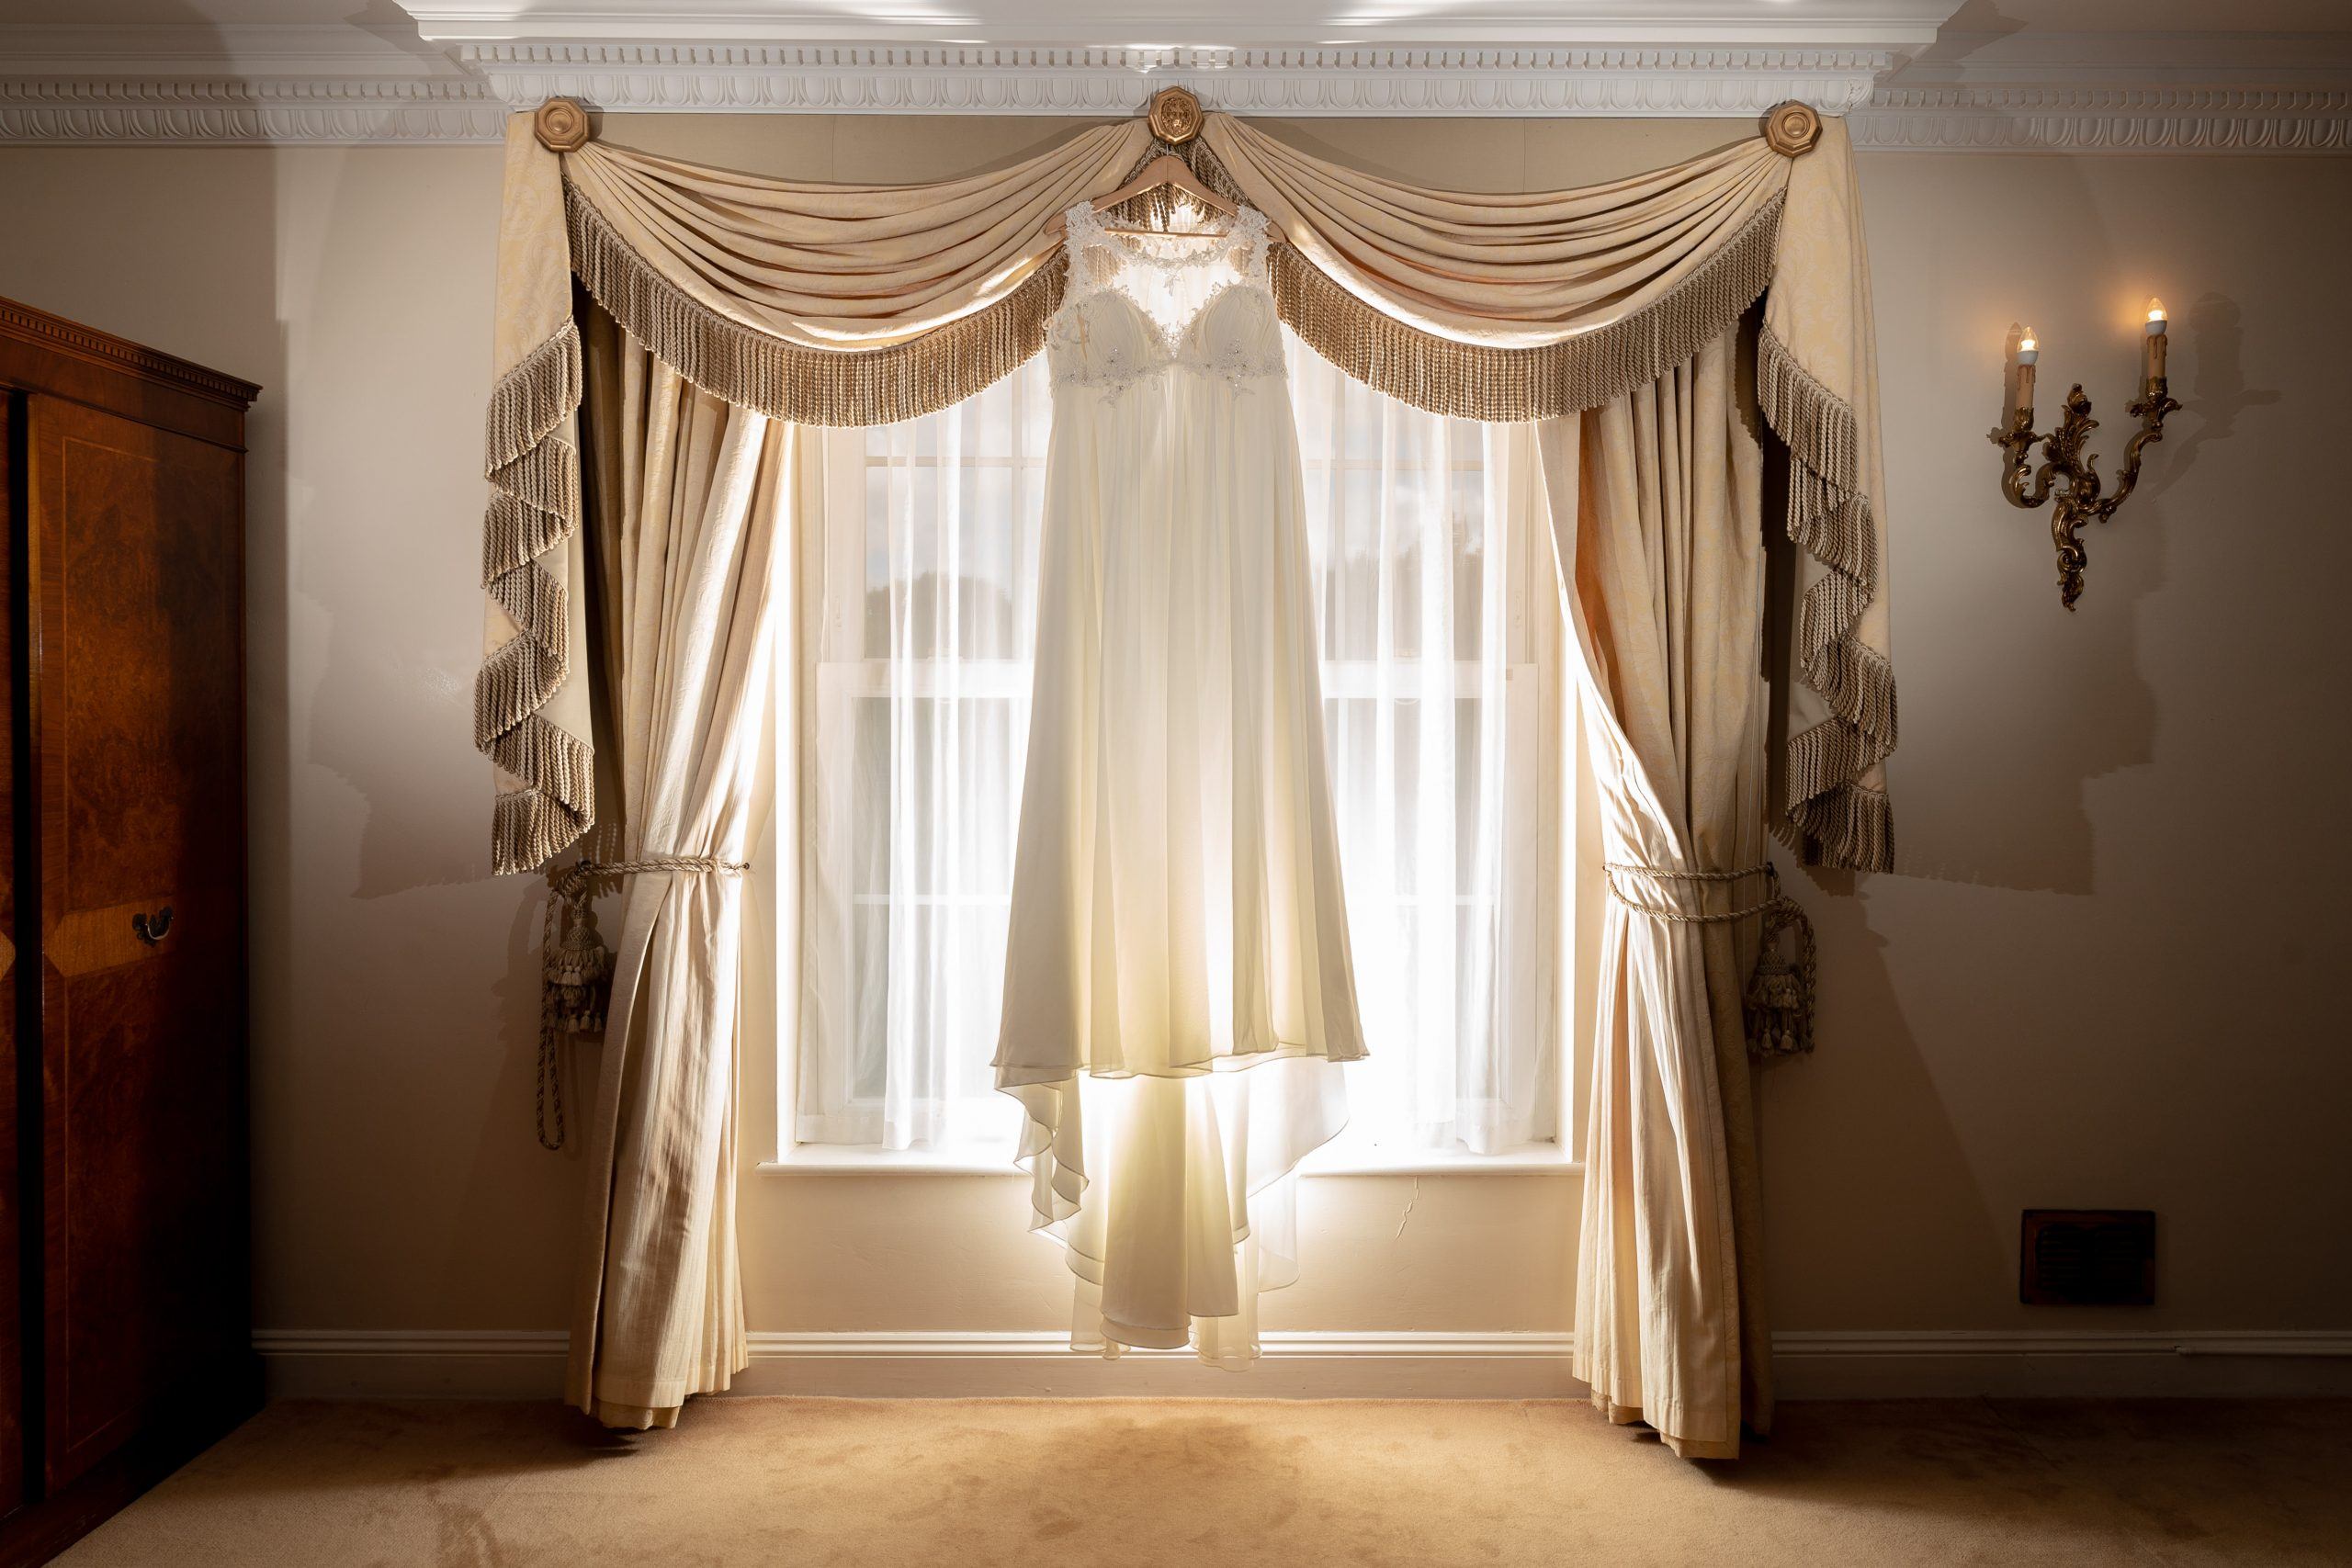 YFFUK Phil Endicott choosing your wedding dress Whittlebury Hall